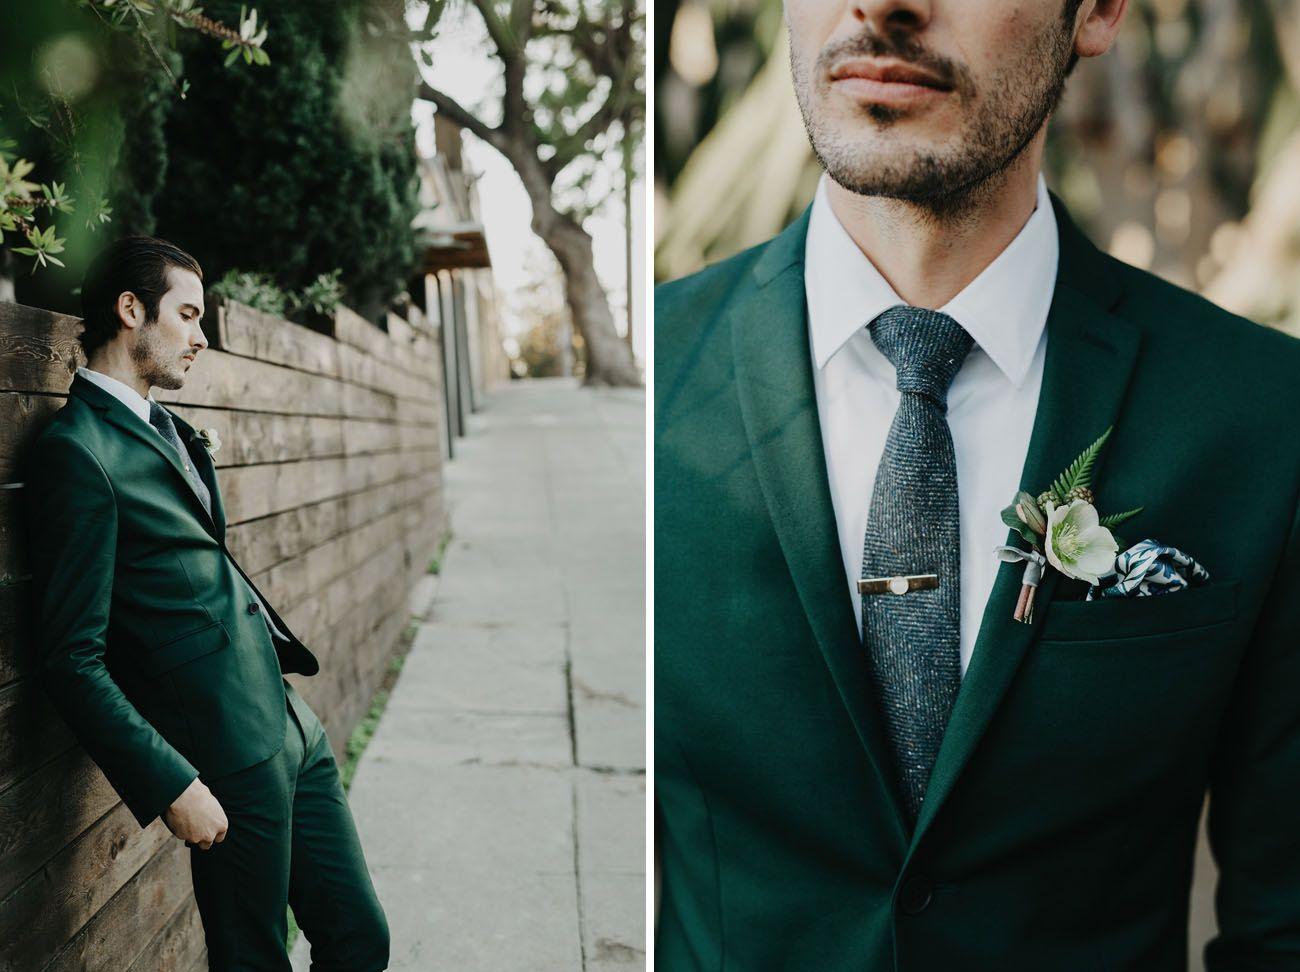 Vintage wedding groom vest - Groom Style Inspiration With Gold Coast Goods Vintage Groomsmenwedding